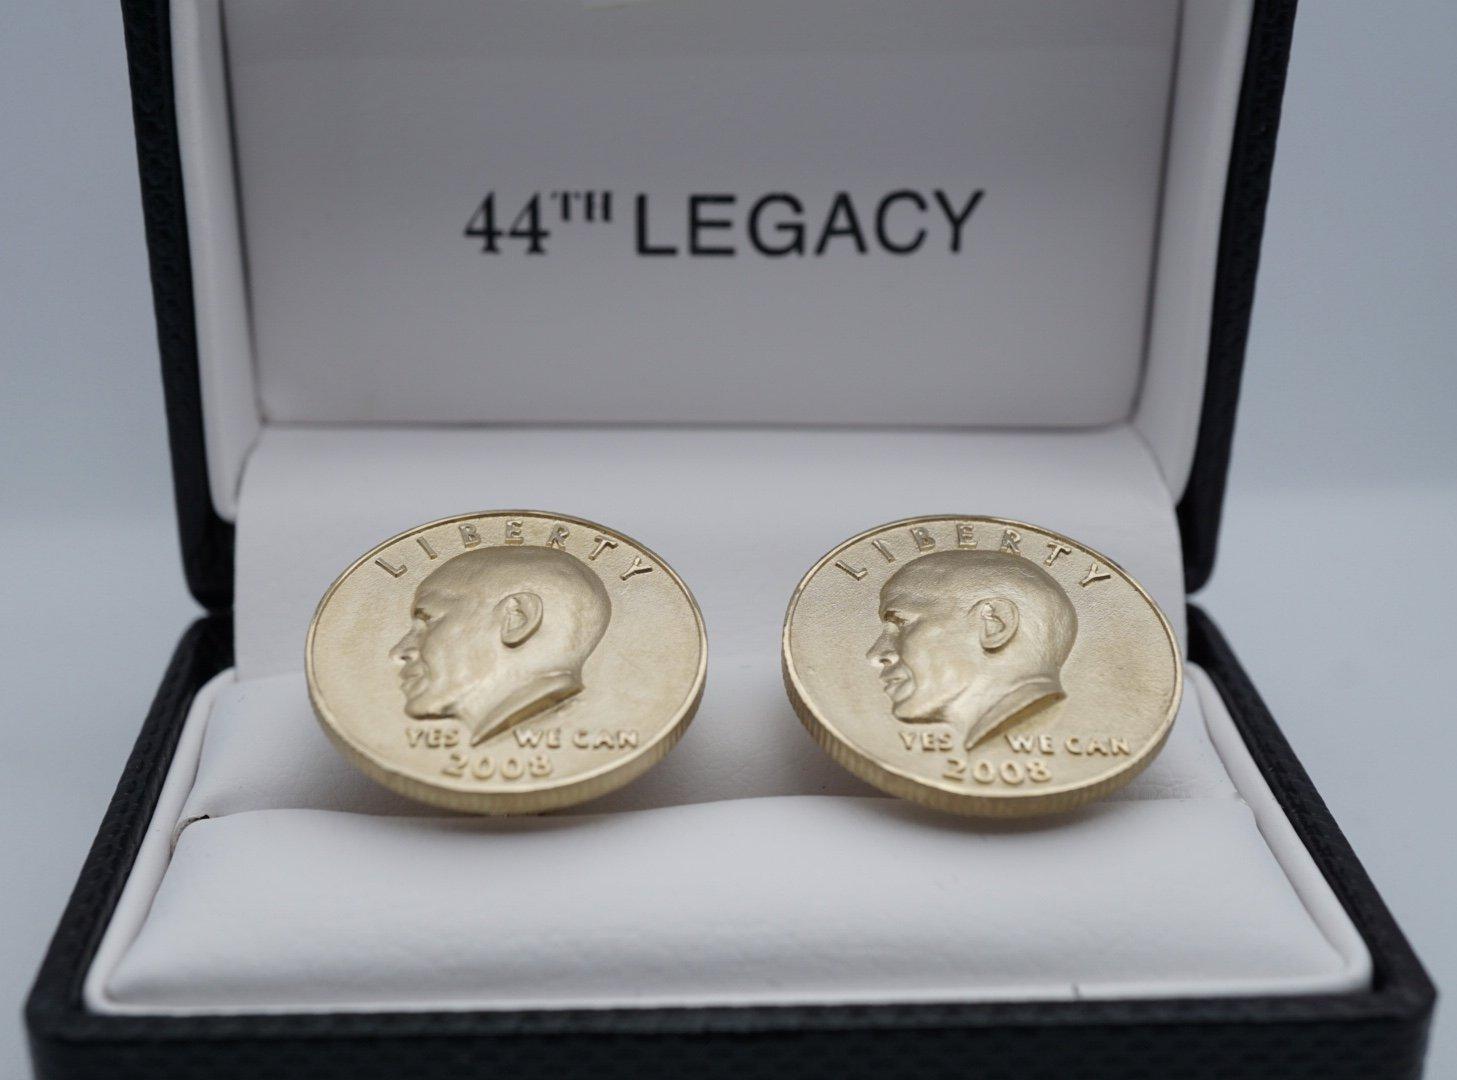 POTUS Cufflinks  - 44th Legacy